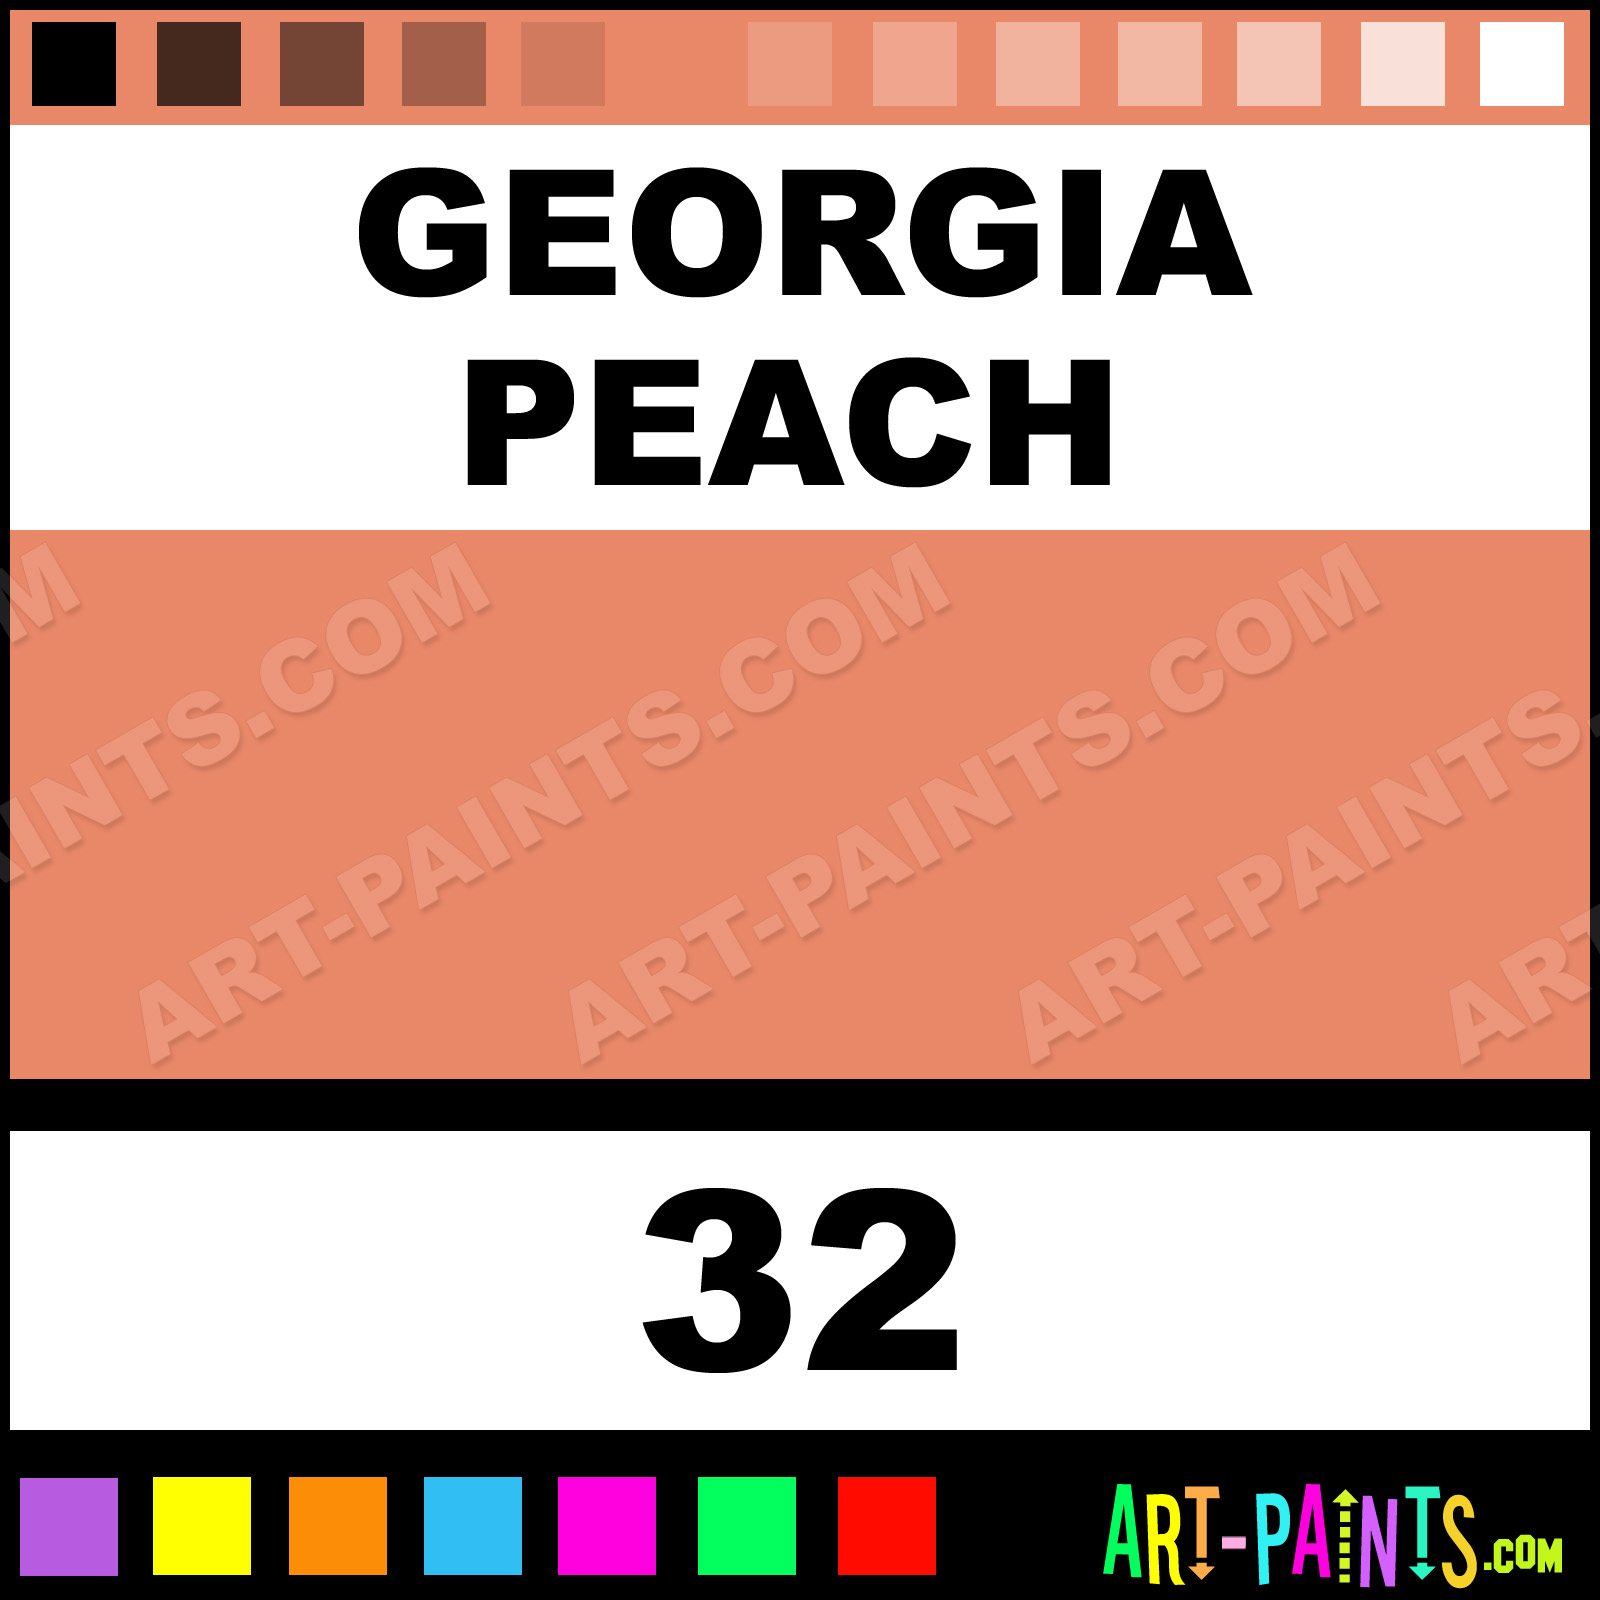 Georgia Peach Bottle Tattoo Ink Paints 32 Georgia Peach Paint